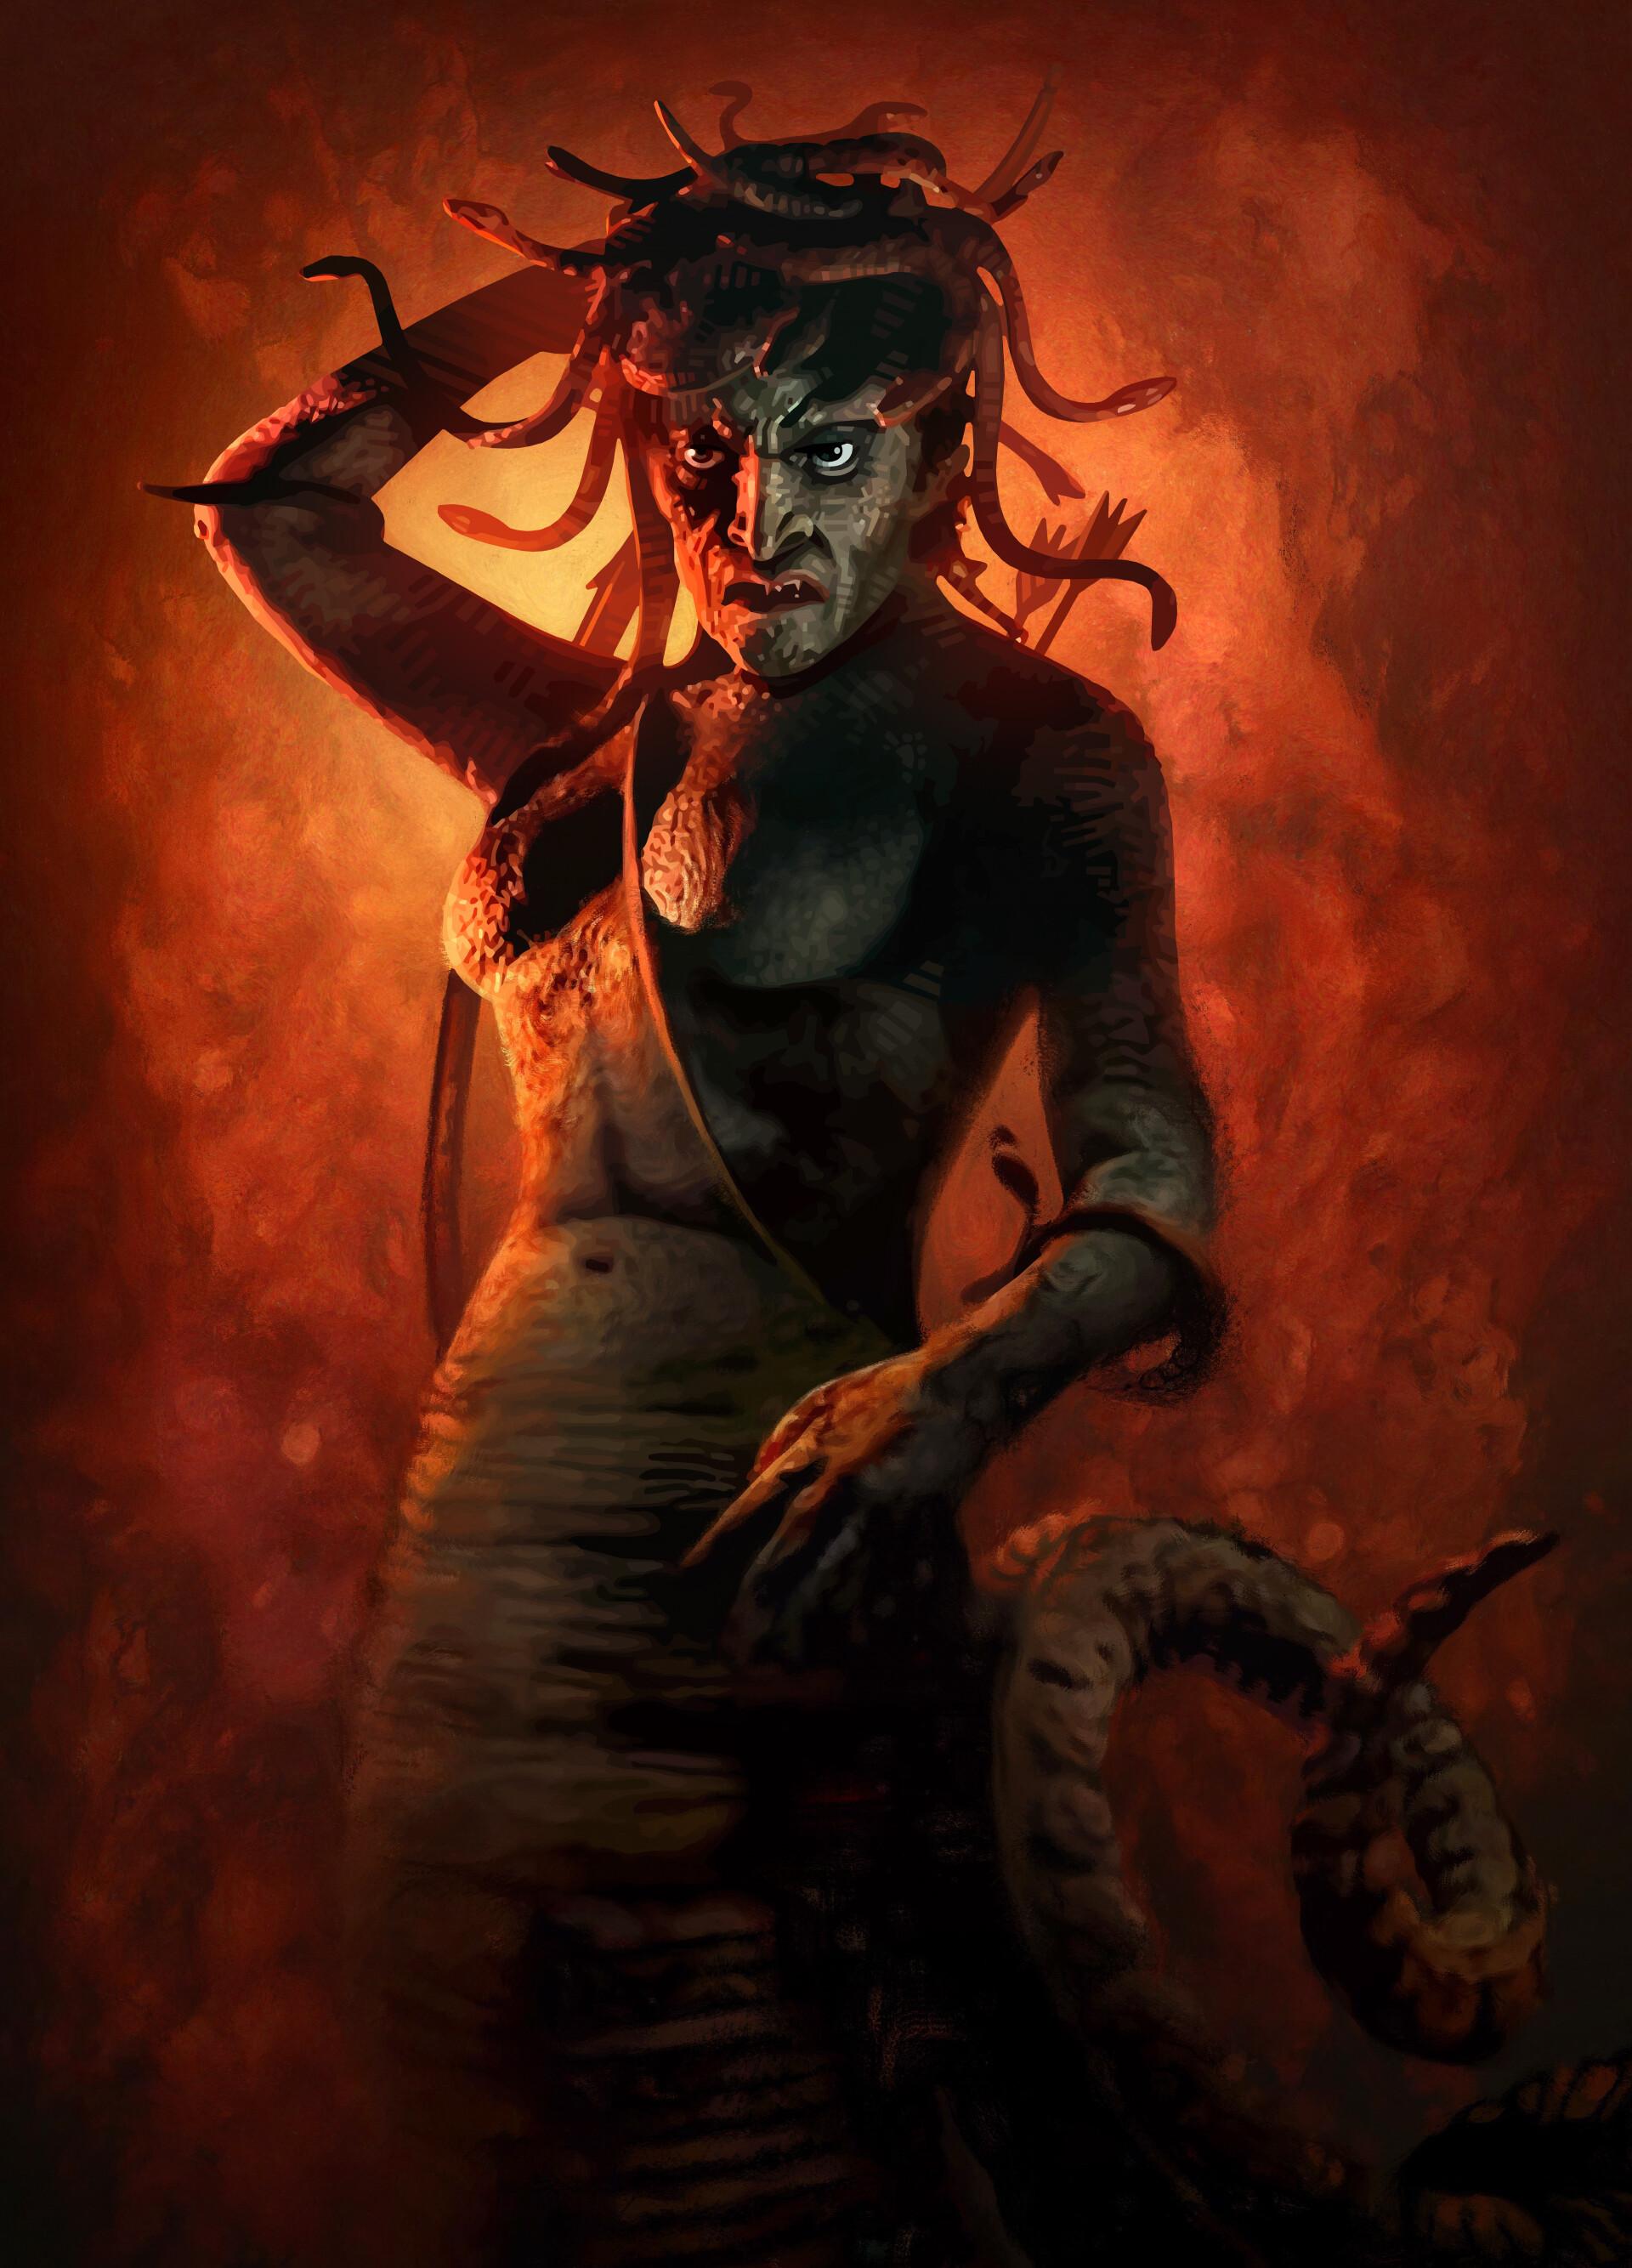 Harryhausen's Medusa